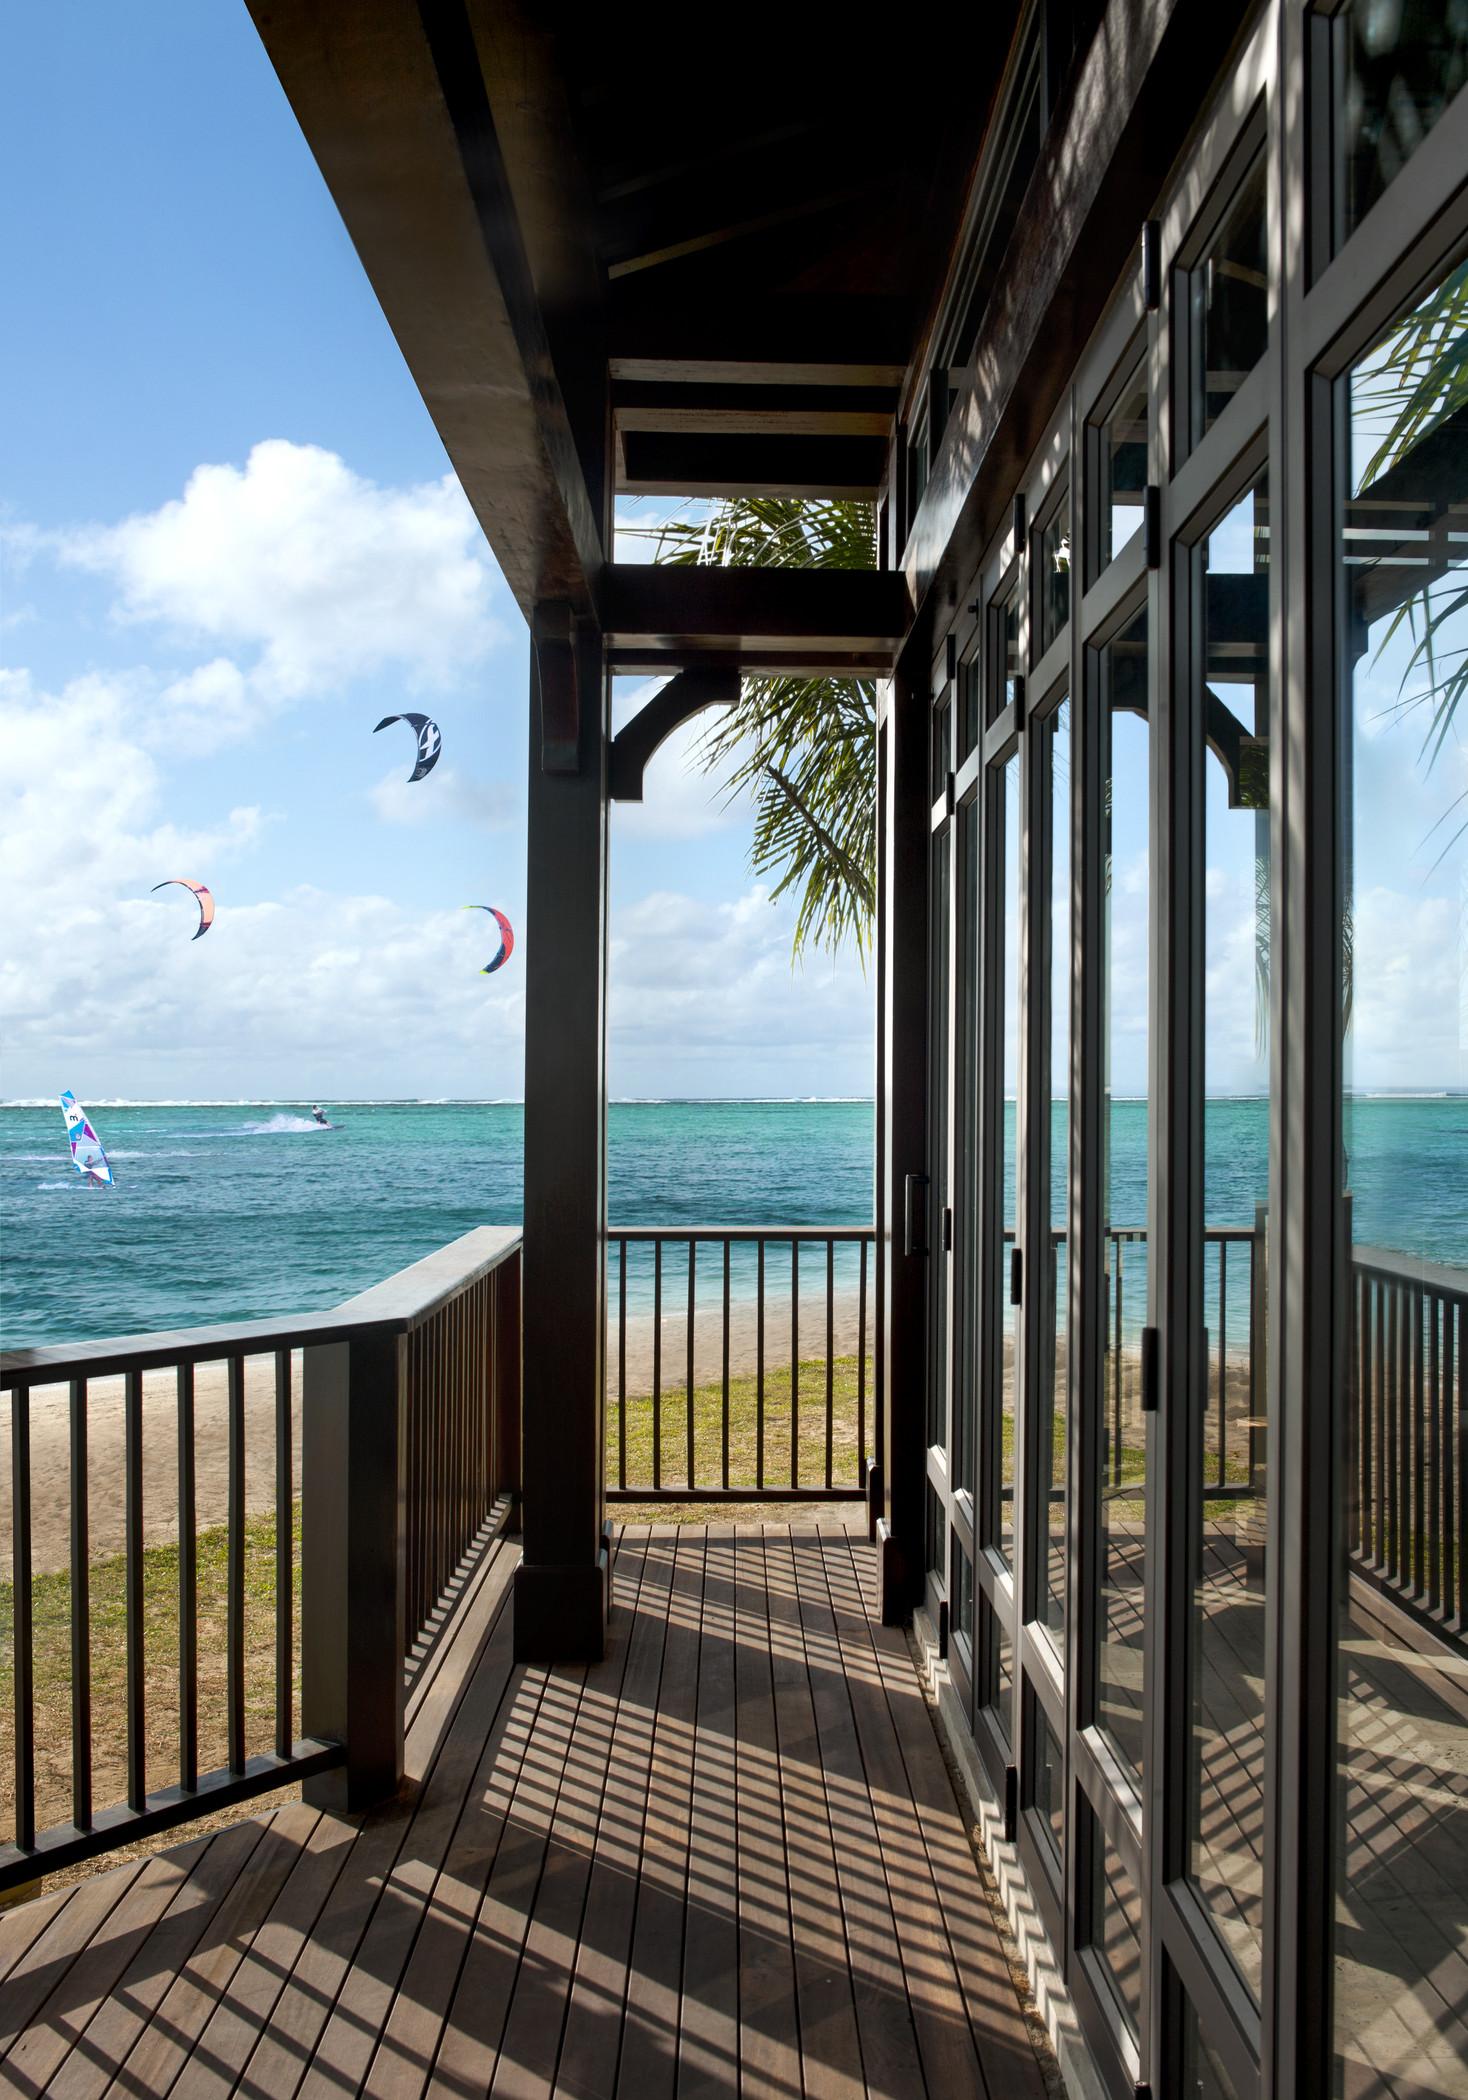 str3459gr-143796-The St Regis Villa Terrace with view on One Eye Kite.jpg